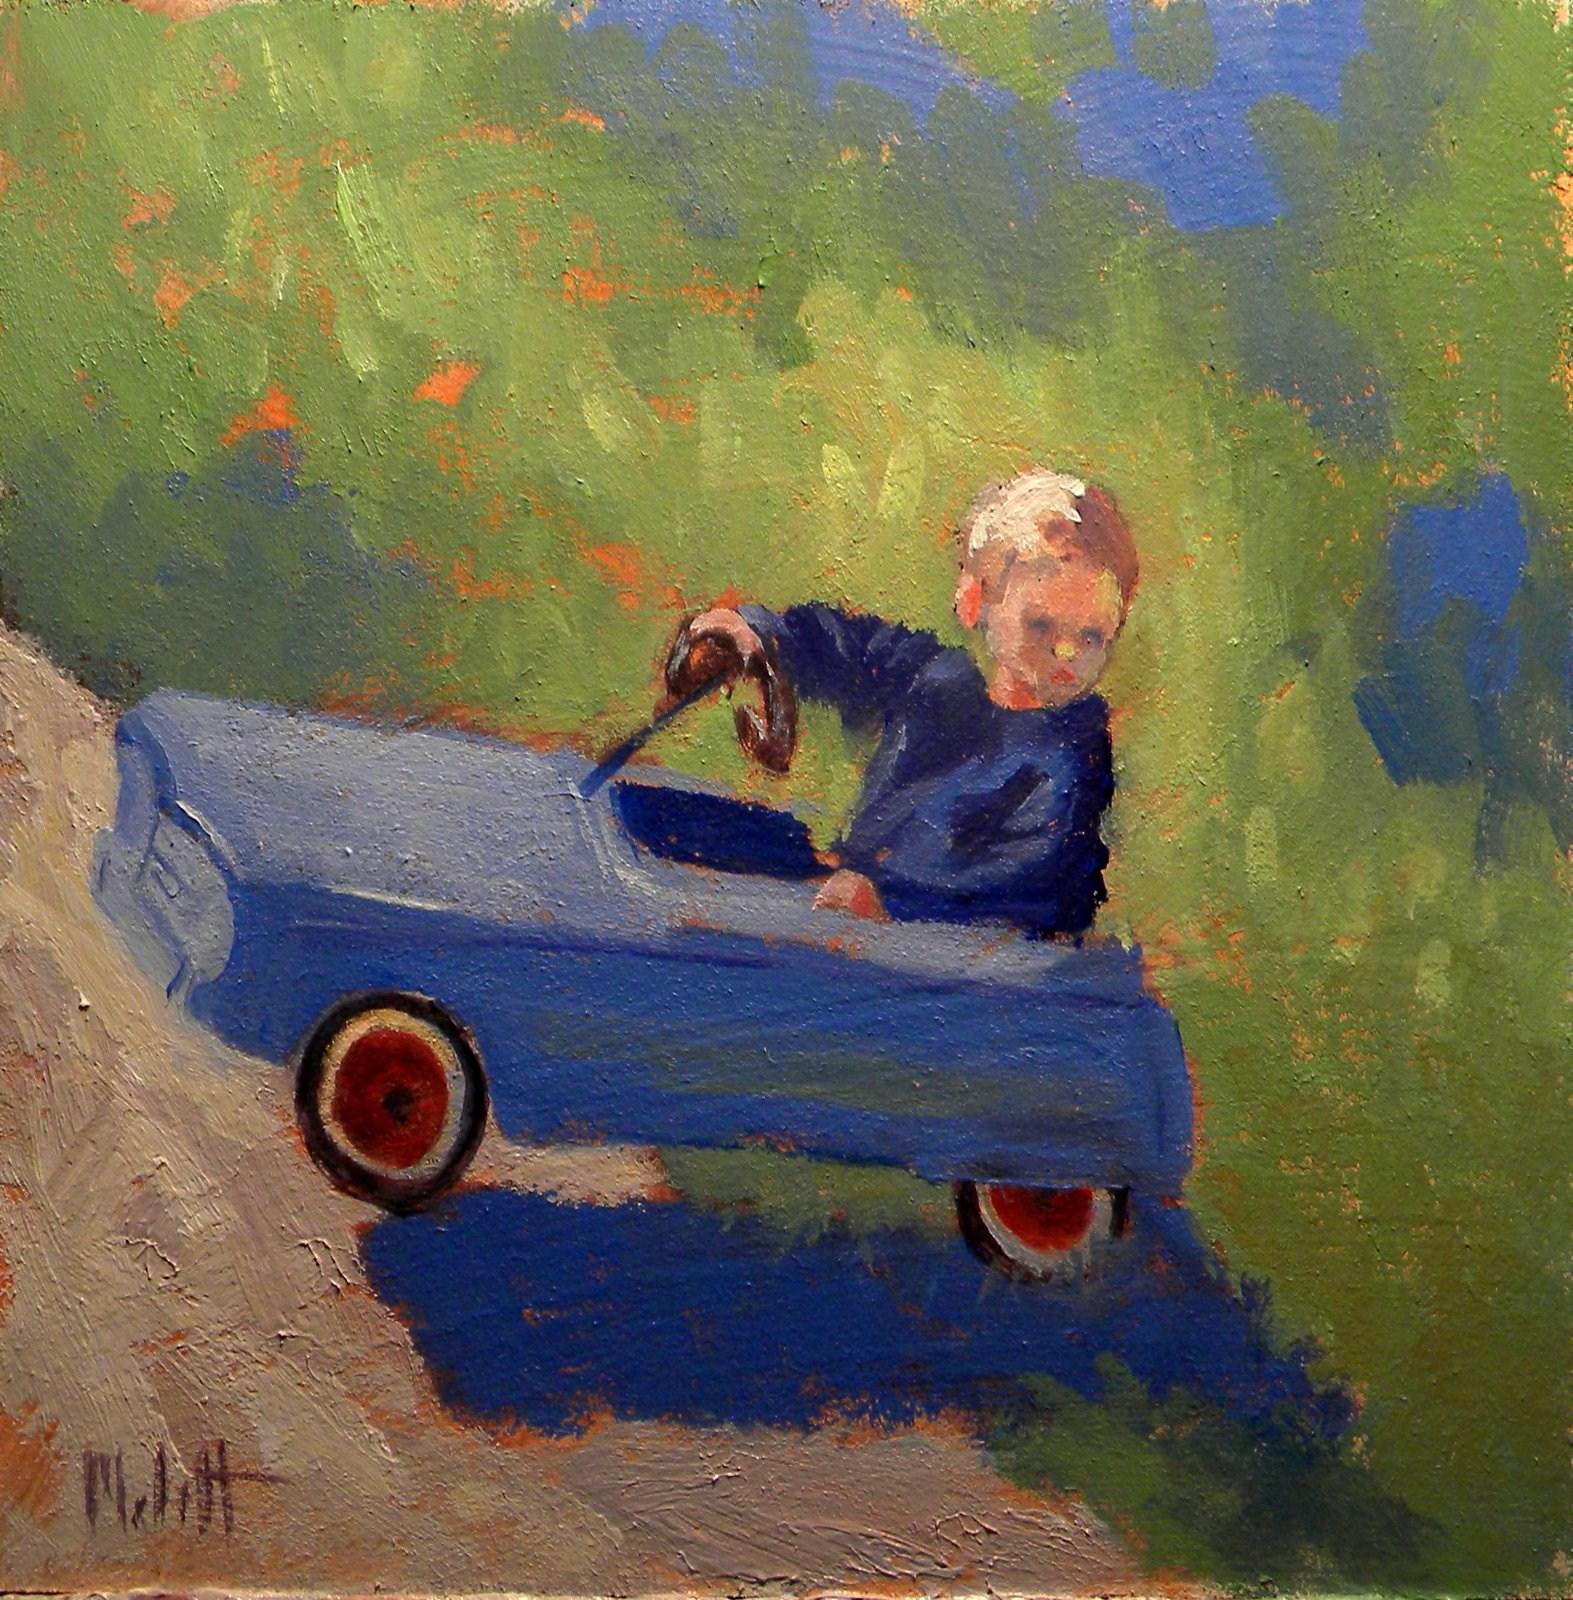 Antique Toy Car Child Contemporary Impressionist Painting original fine art by Heidi Malott